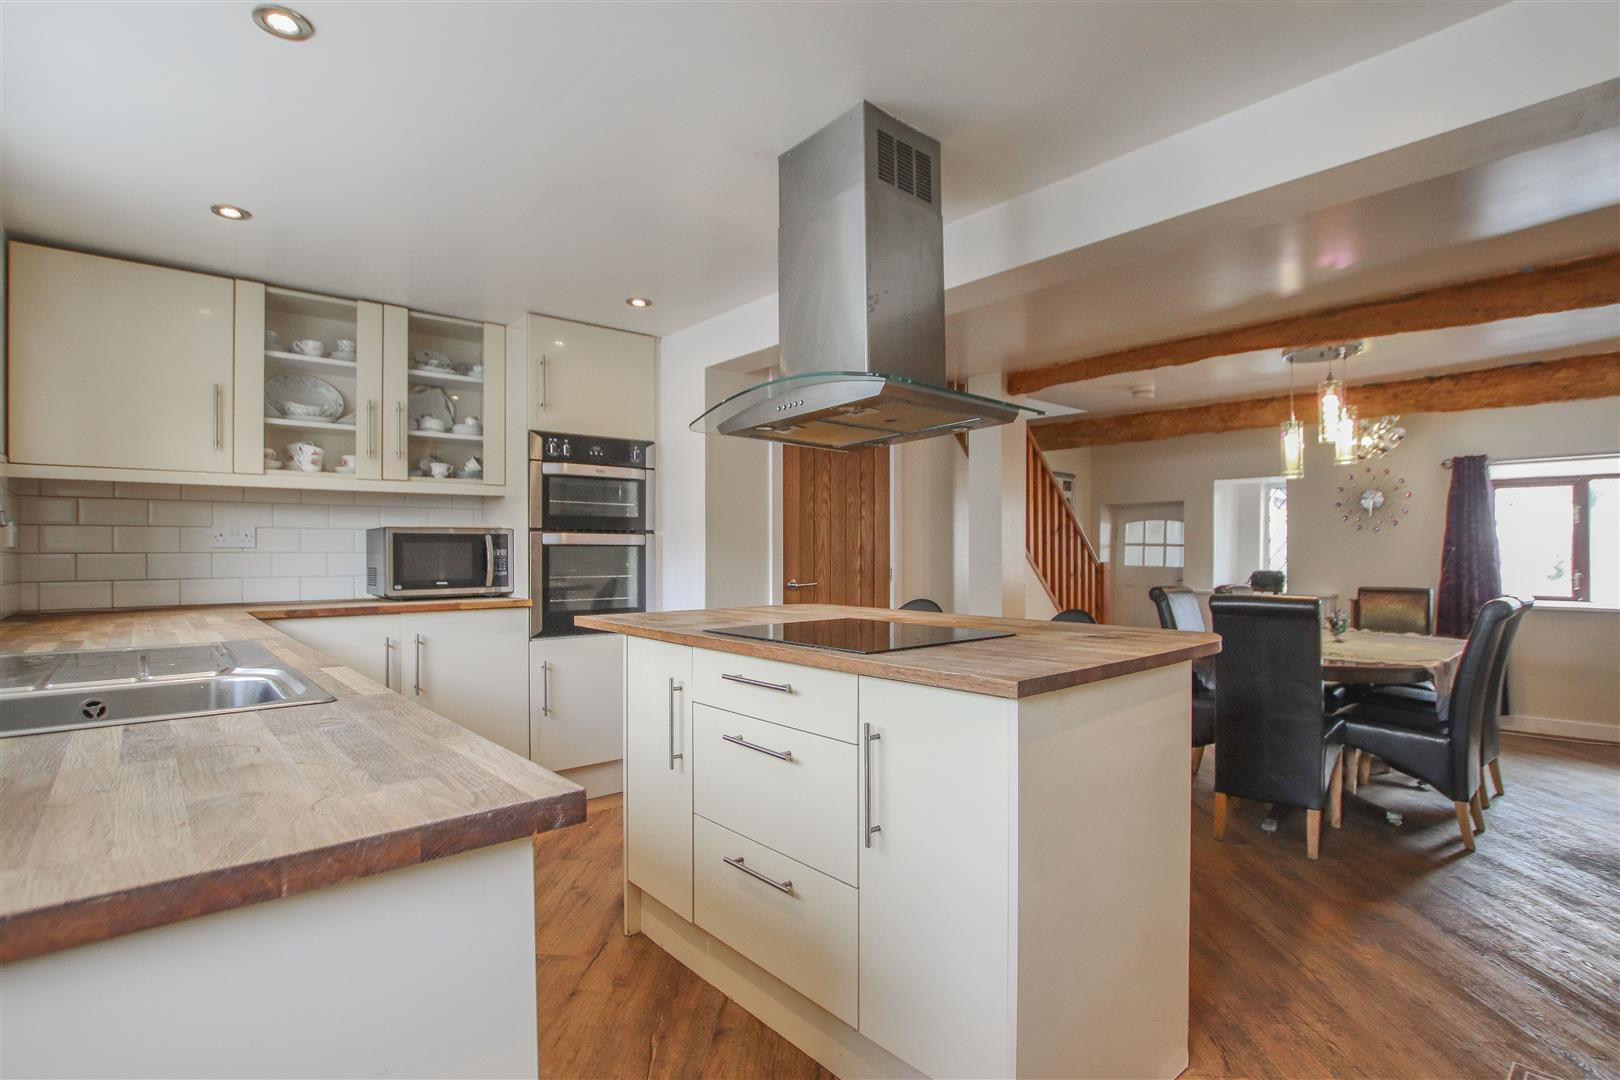 4 Bedroom Farmhouse For Sale - Main Image